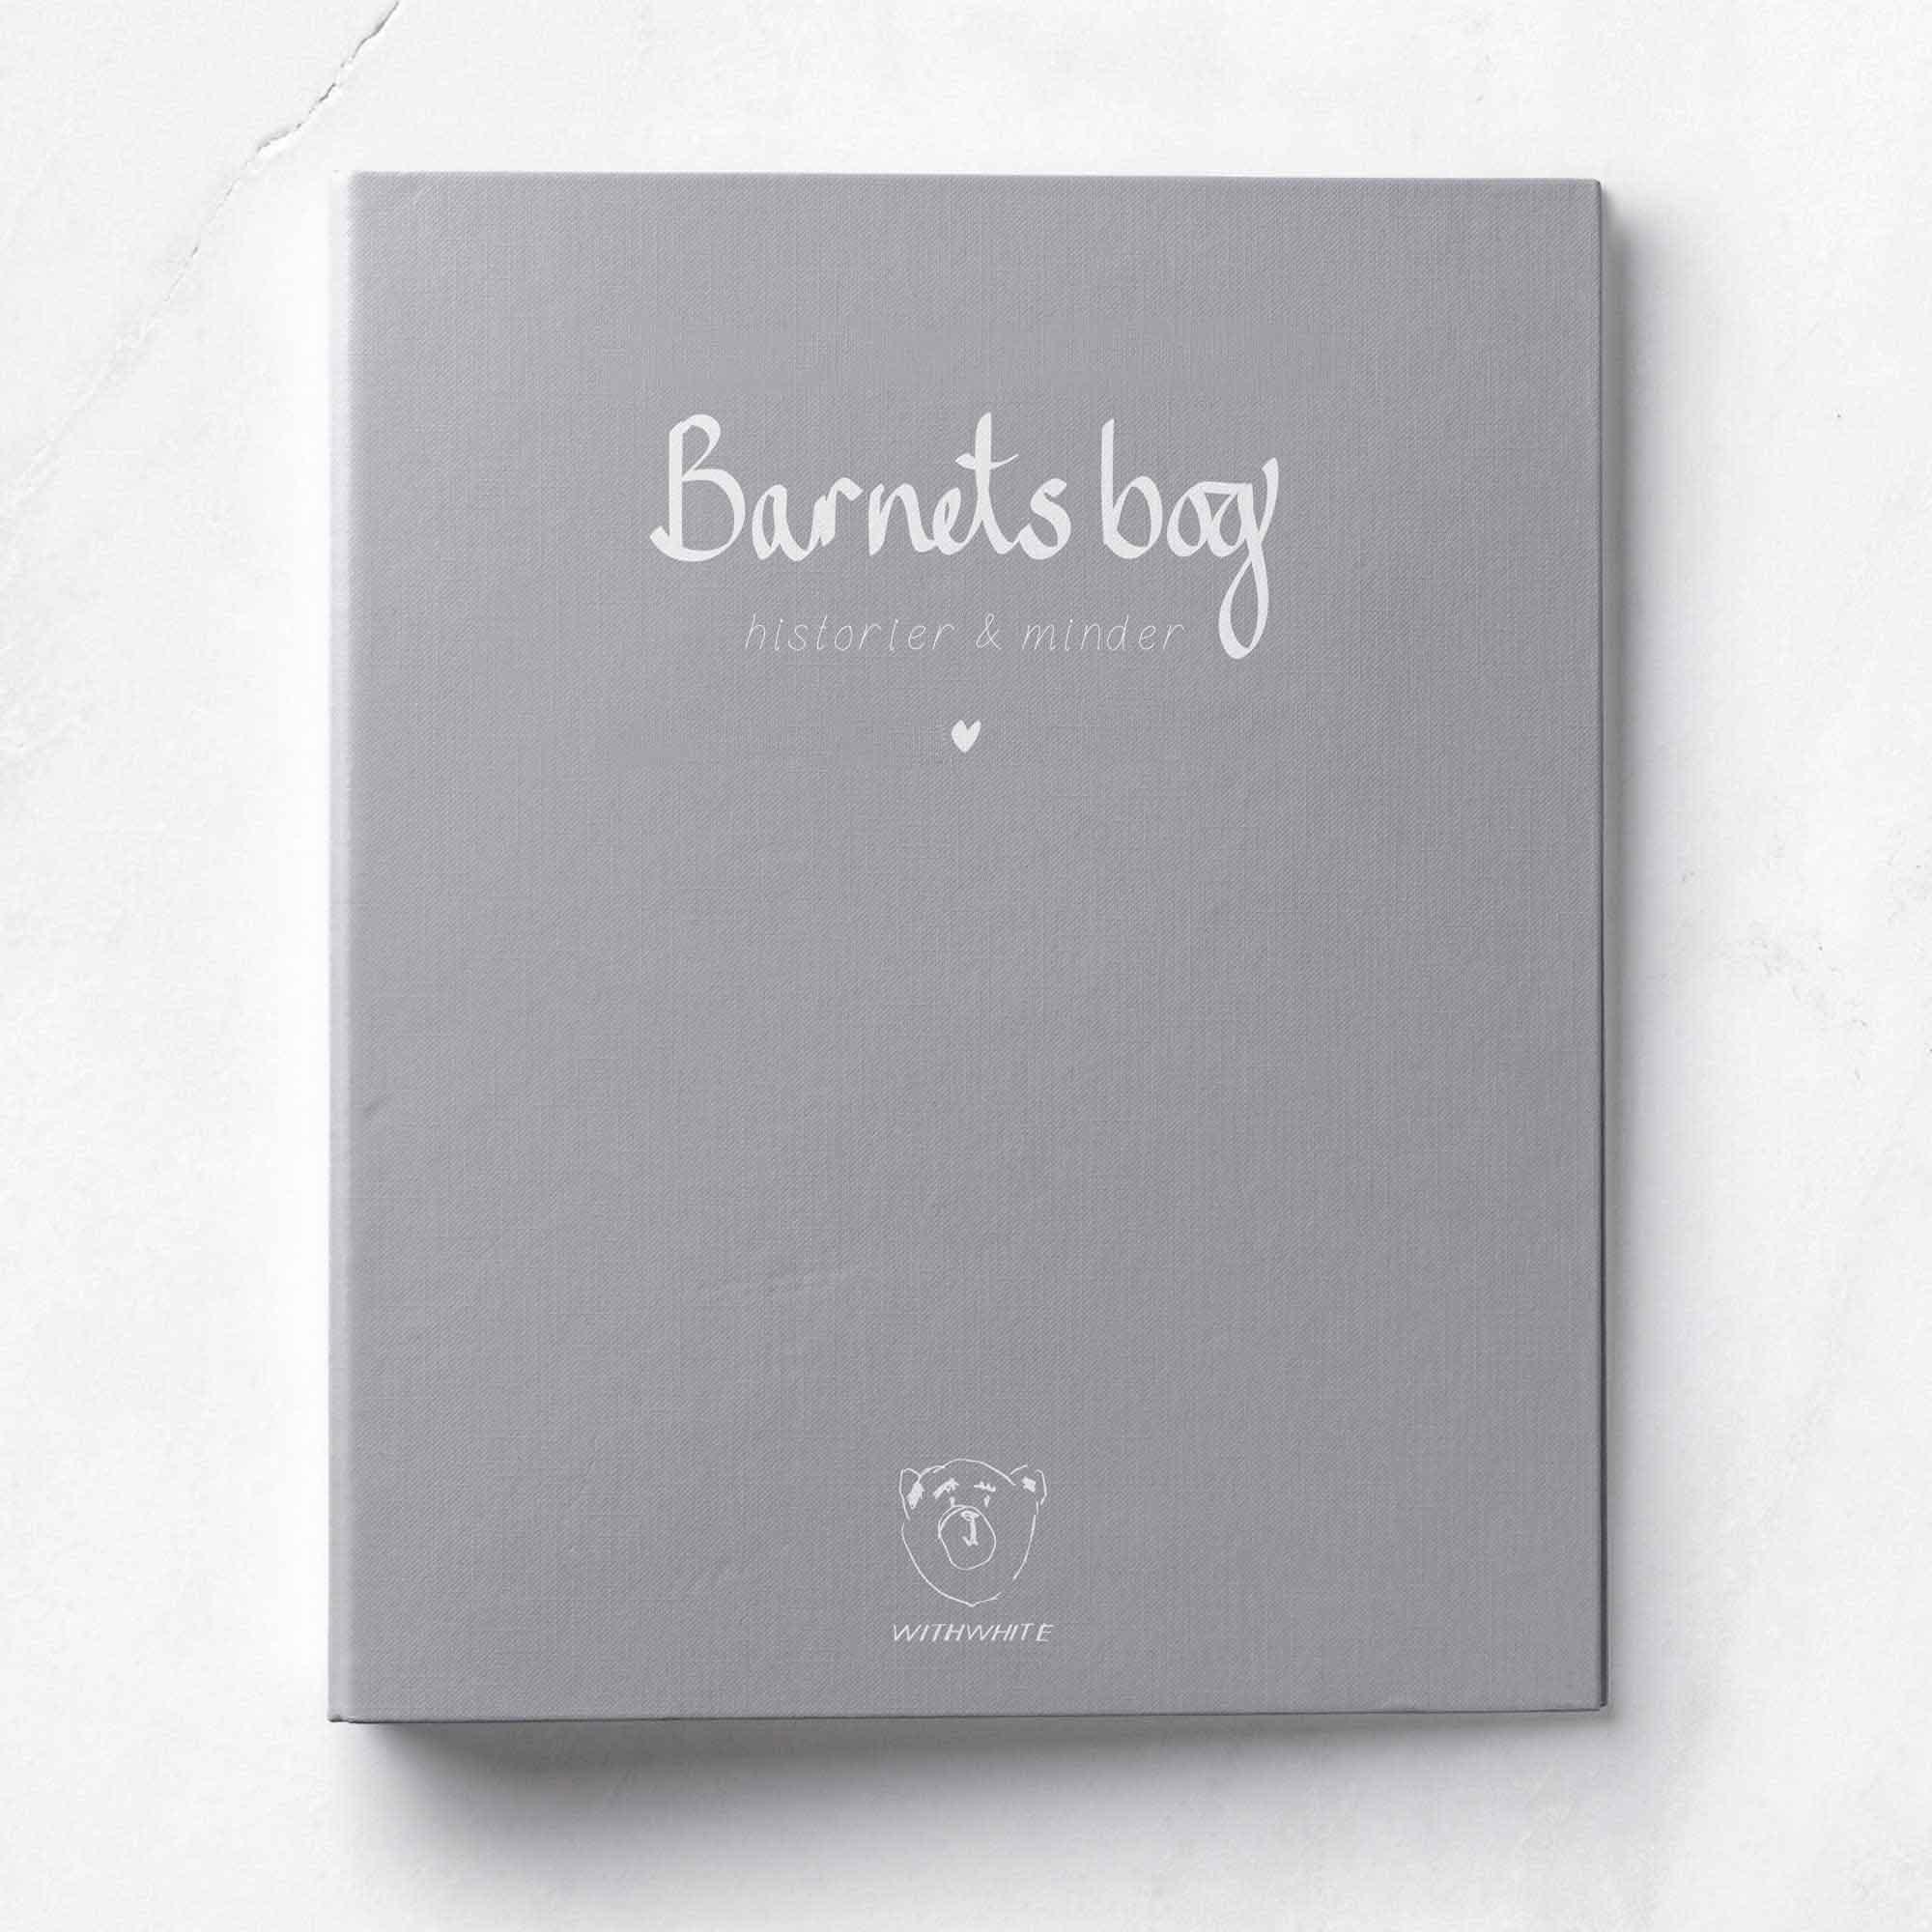 Barnets bog (dansk)